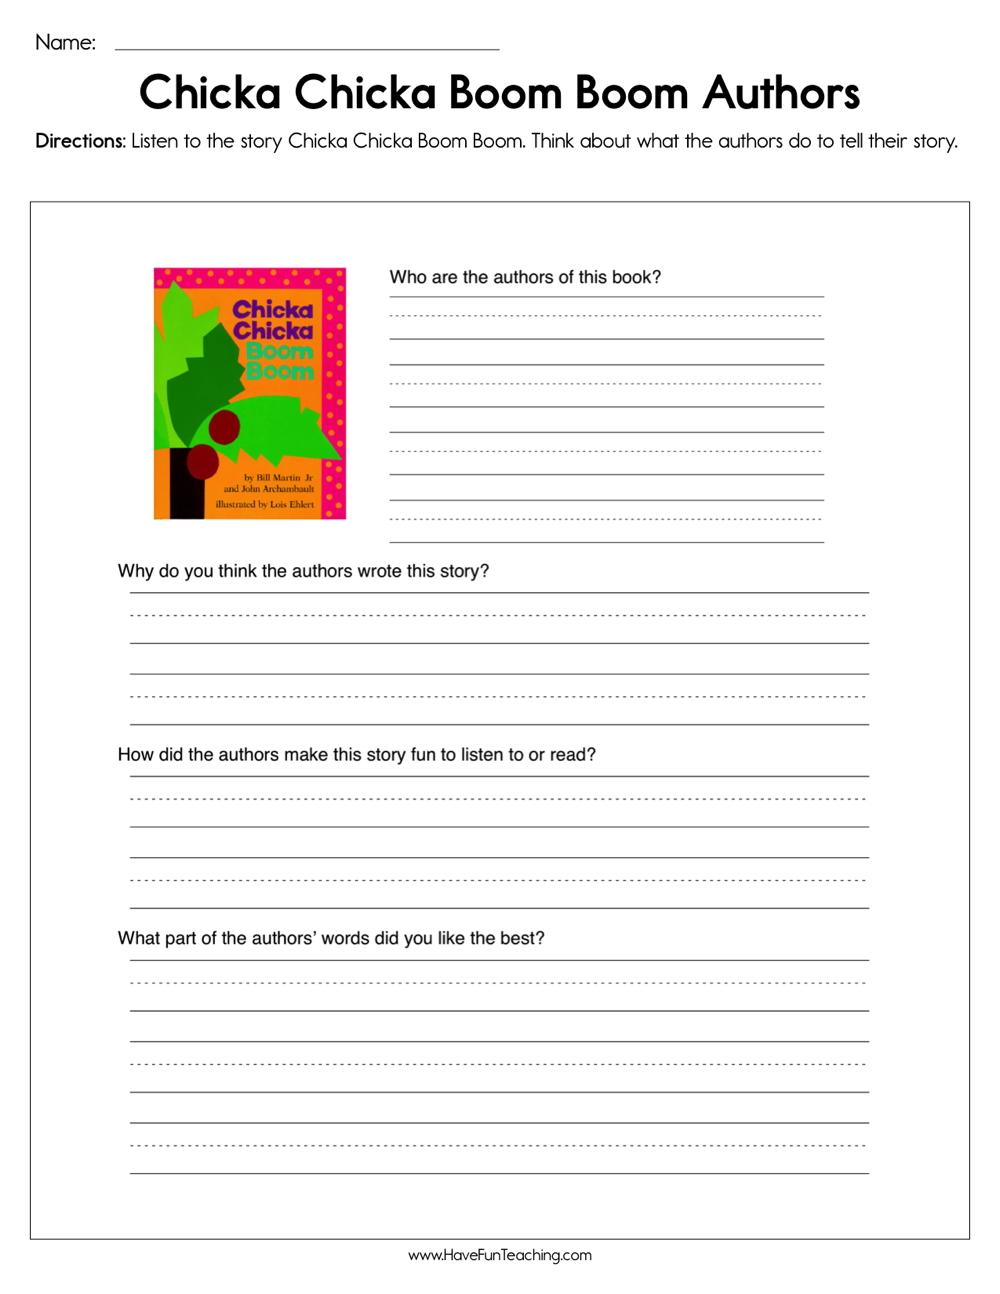 Chicka Chicka Boom Boom Authors Worksheet